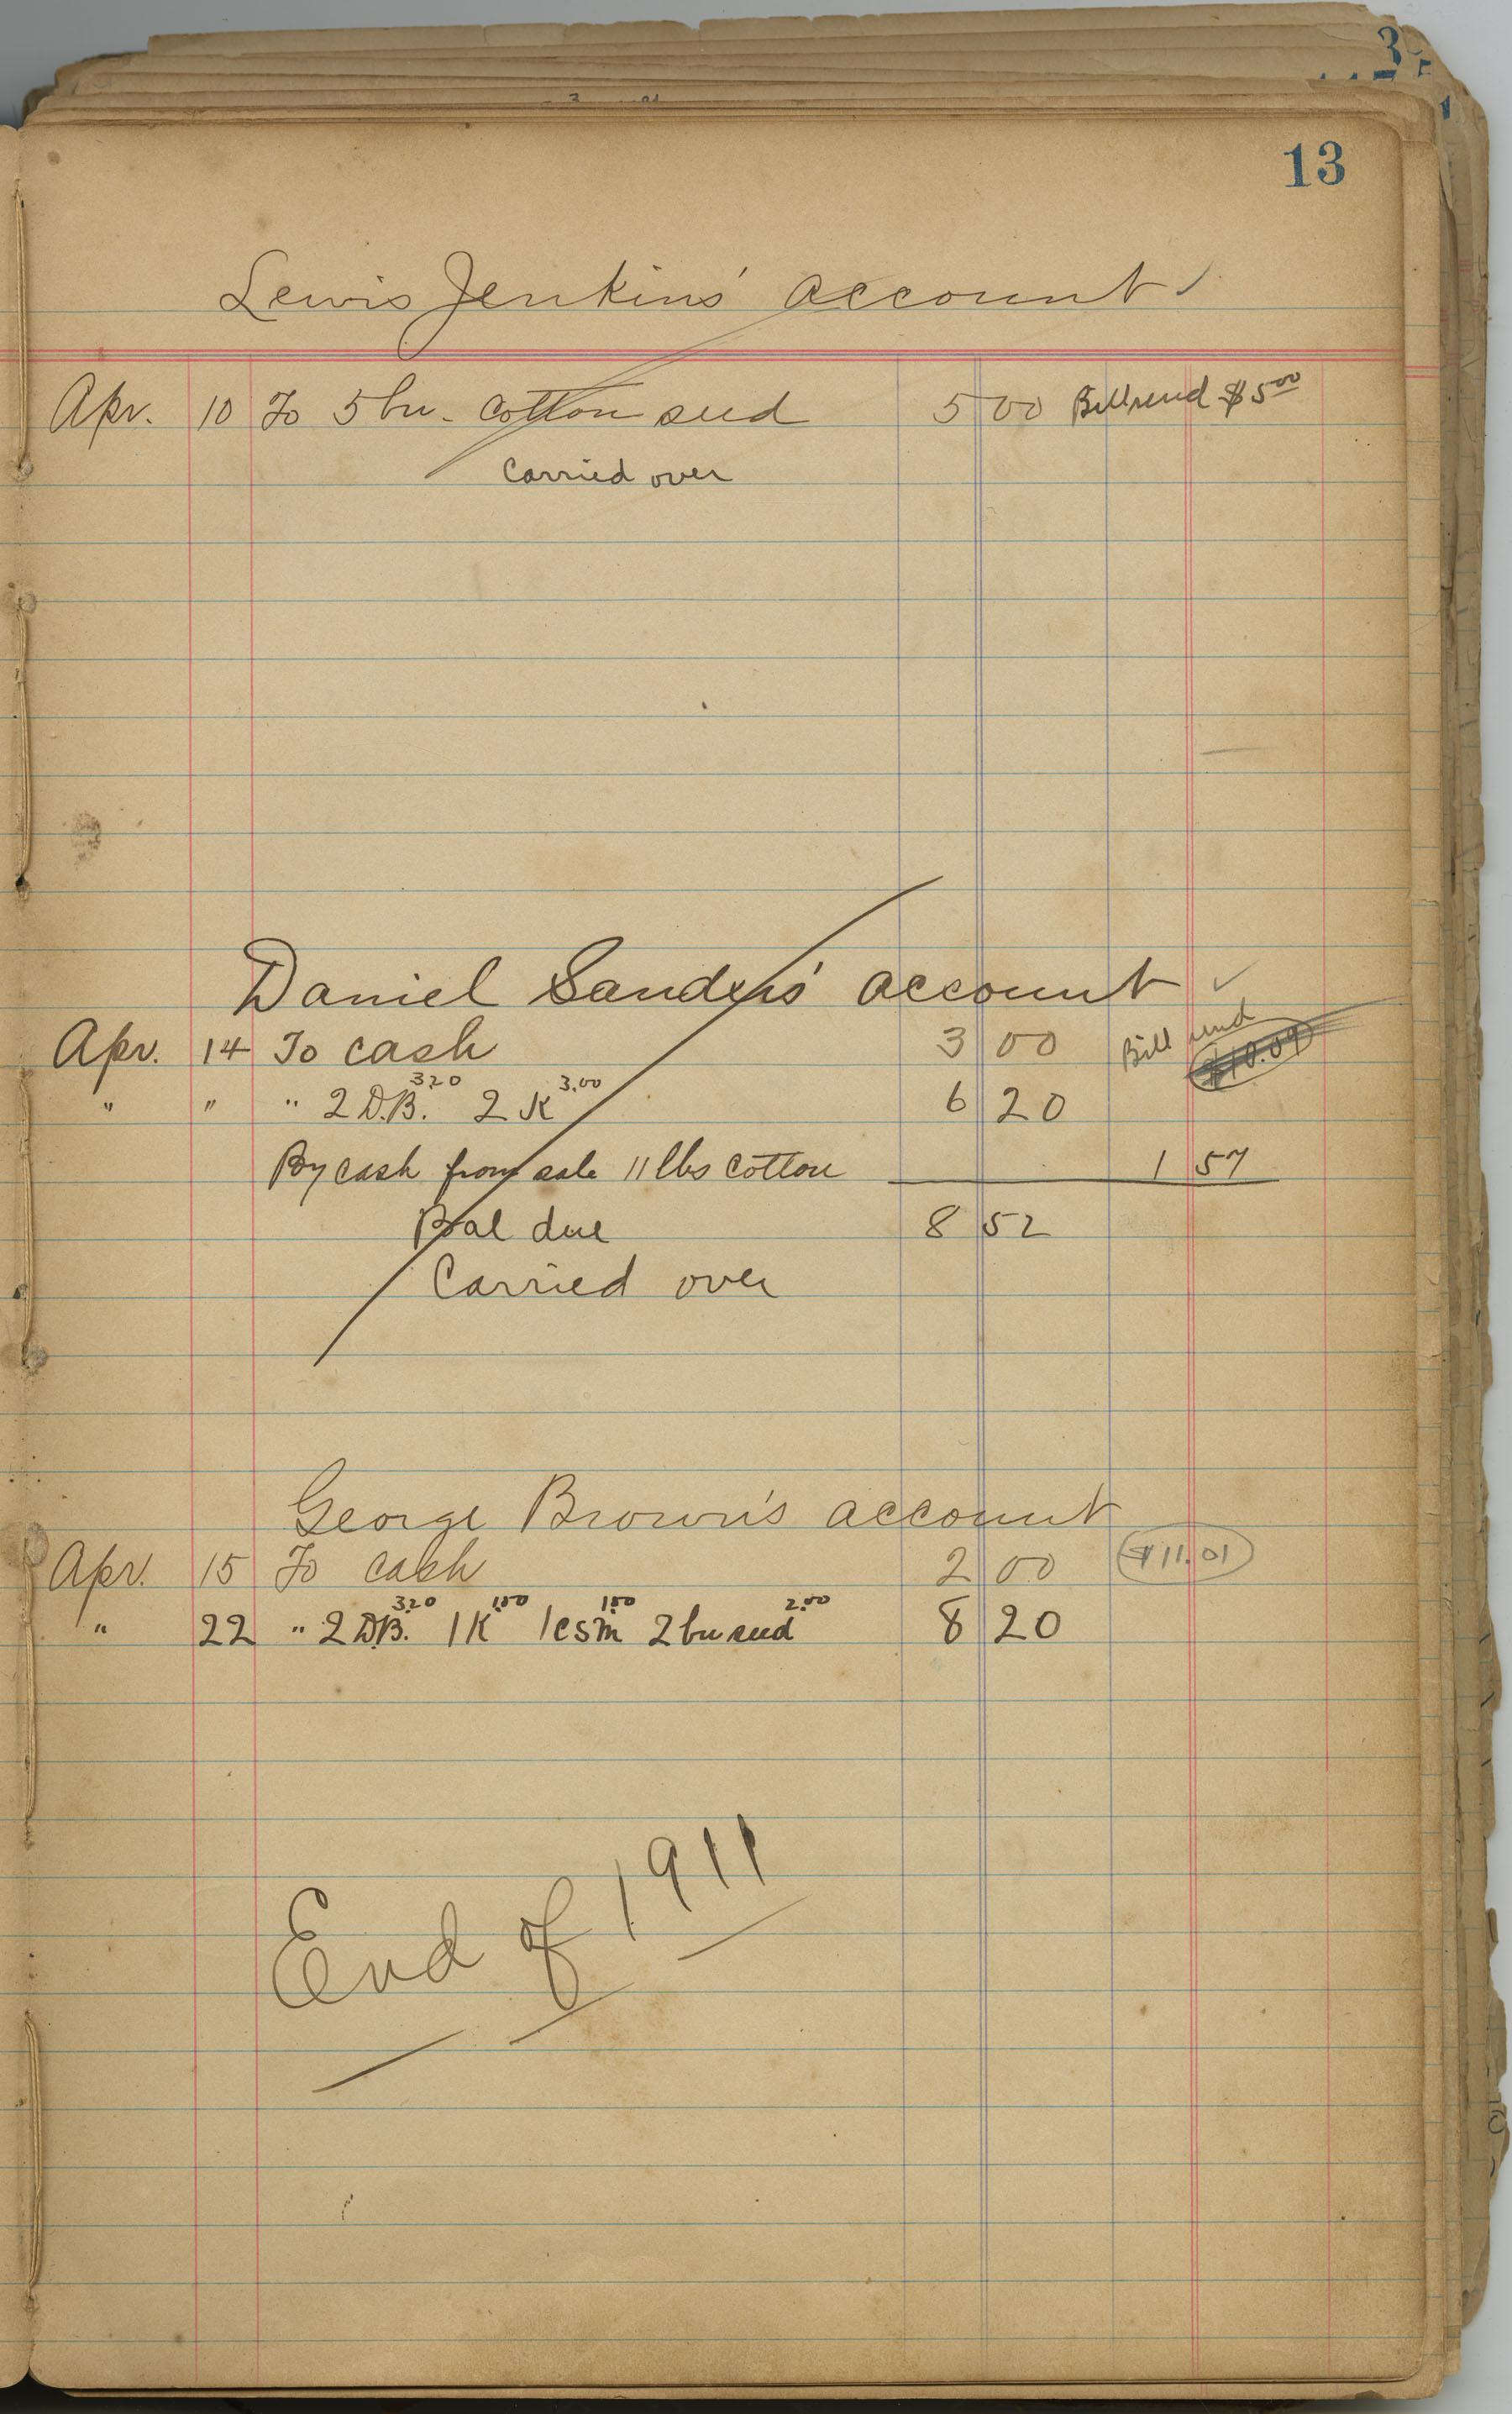 McLeod Plantation Journal, Page 32